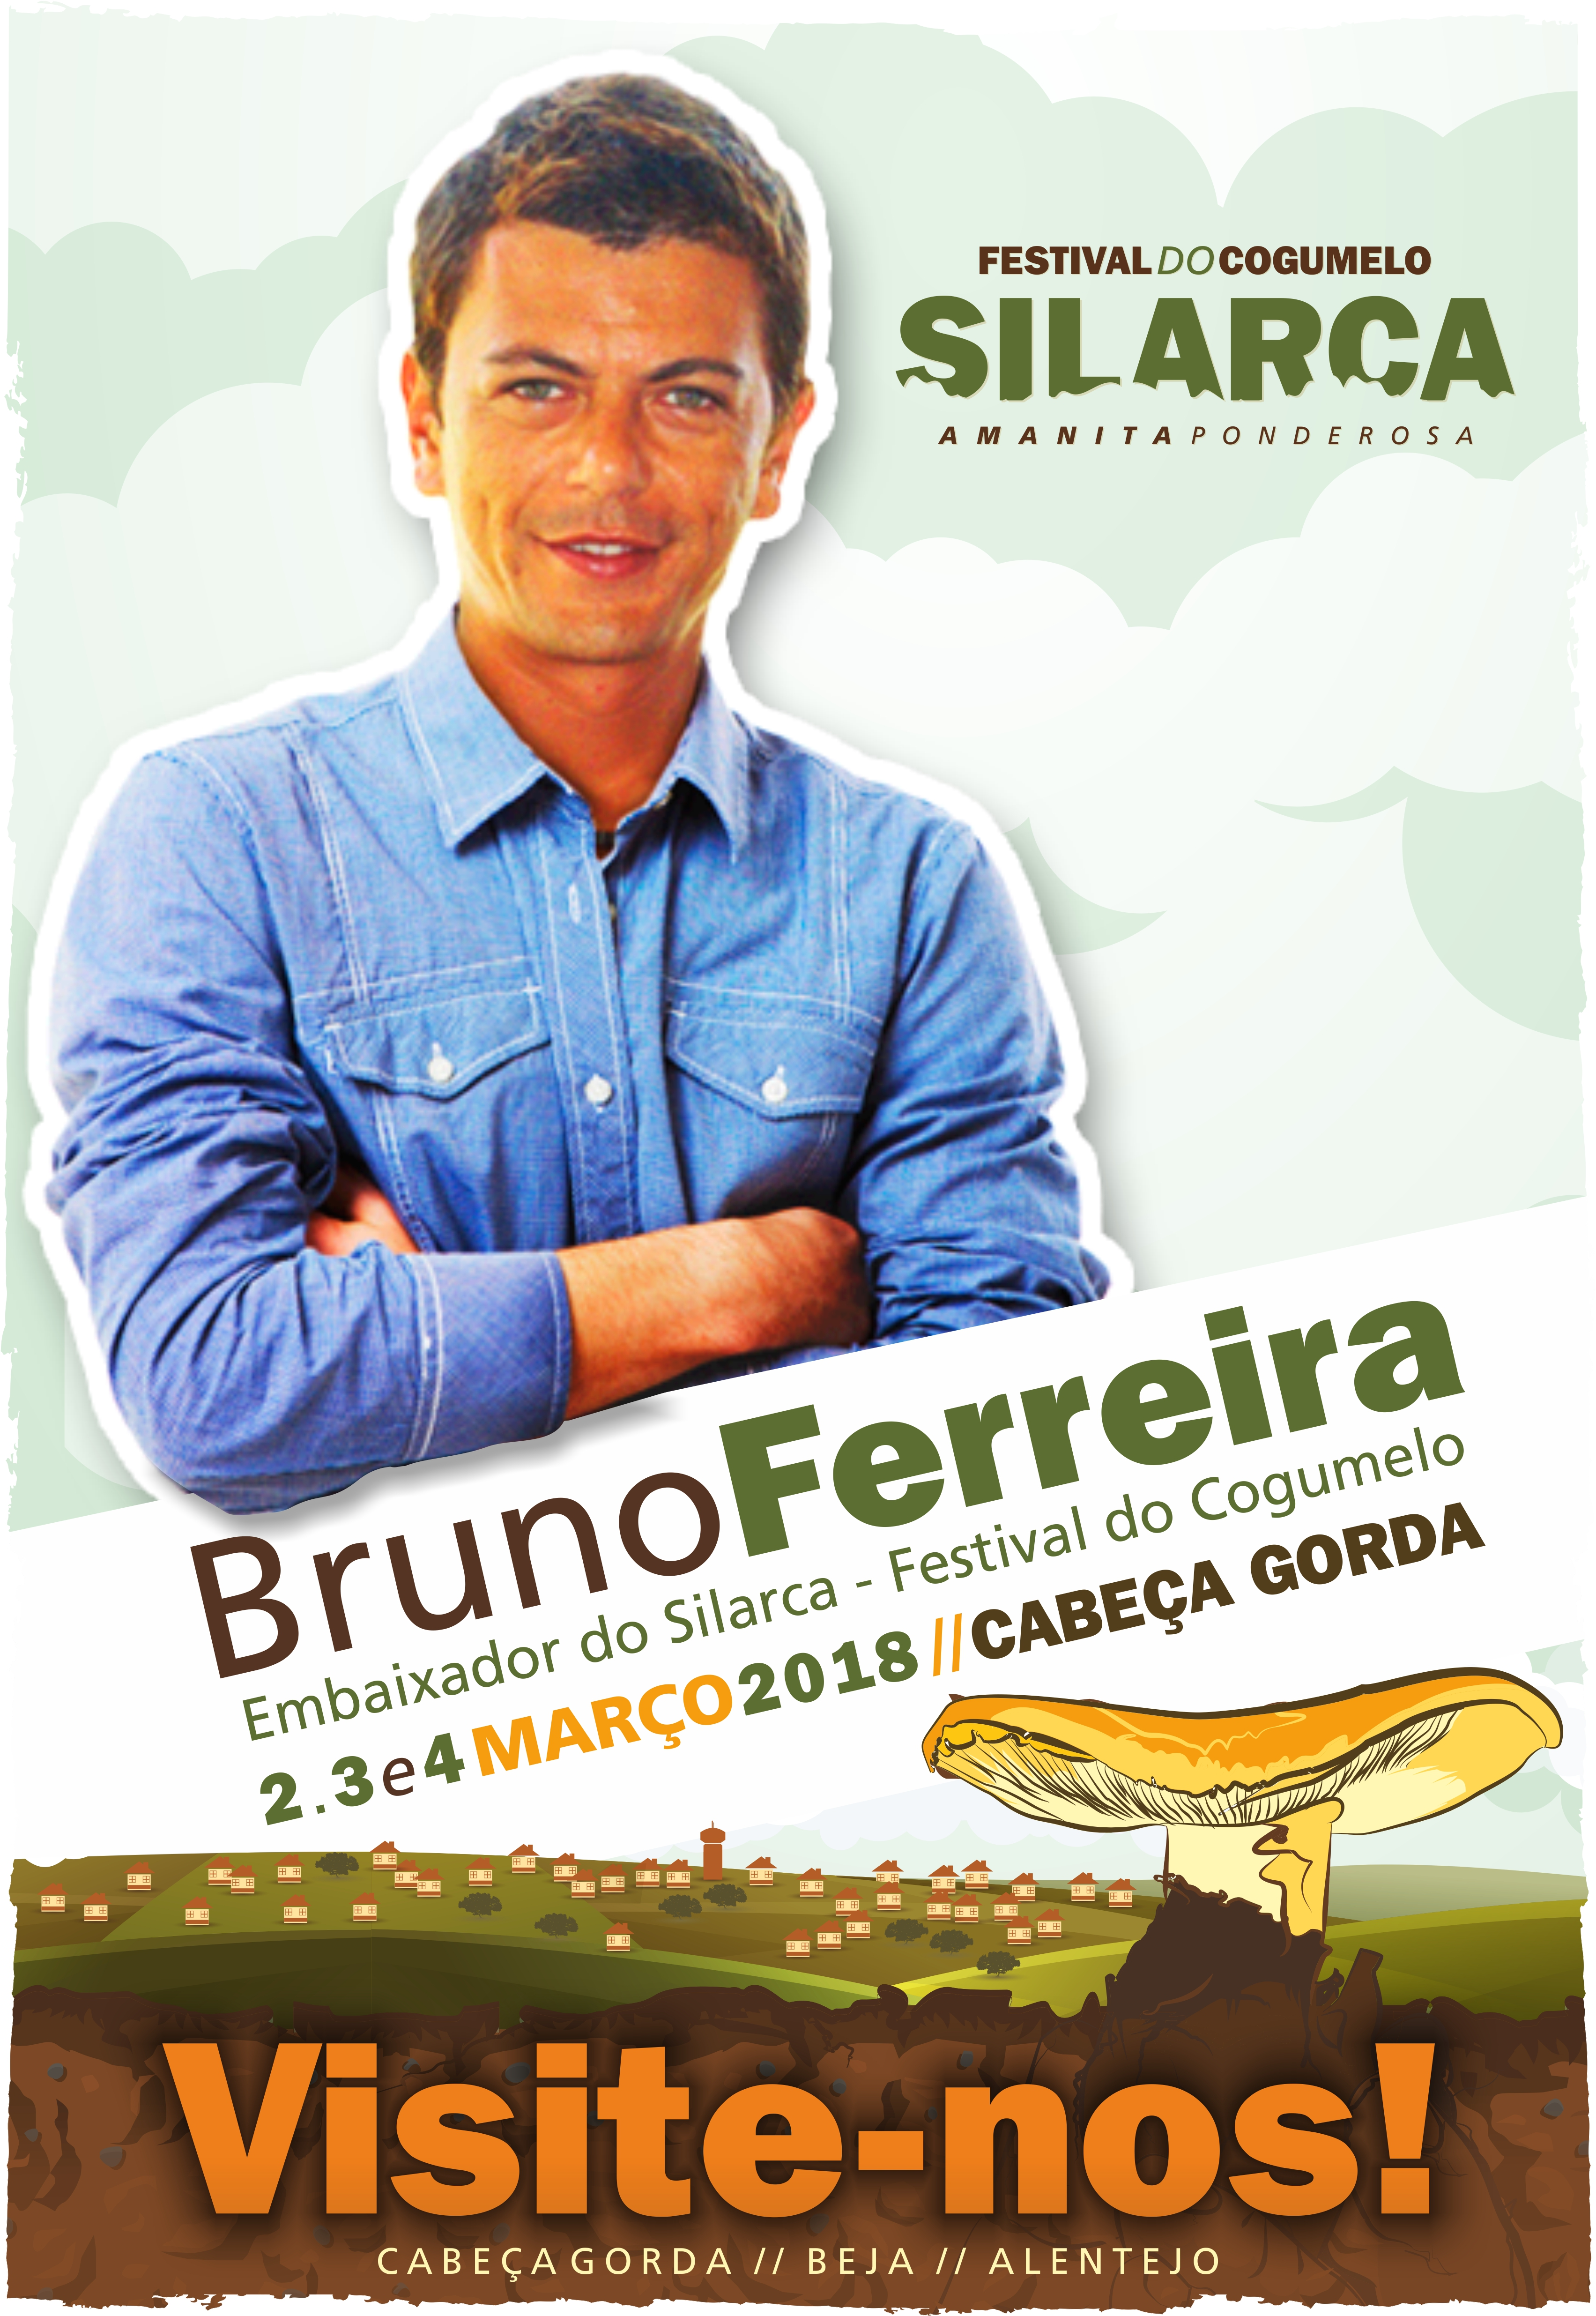 Bruno Ferreira_2018_Silarca